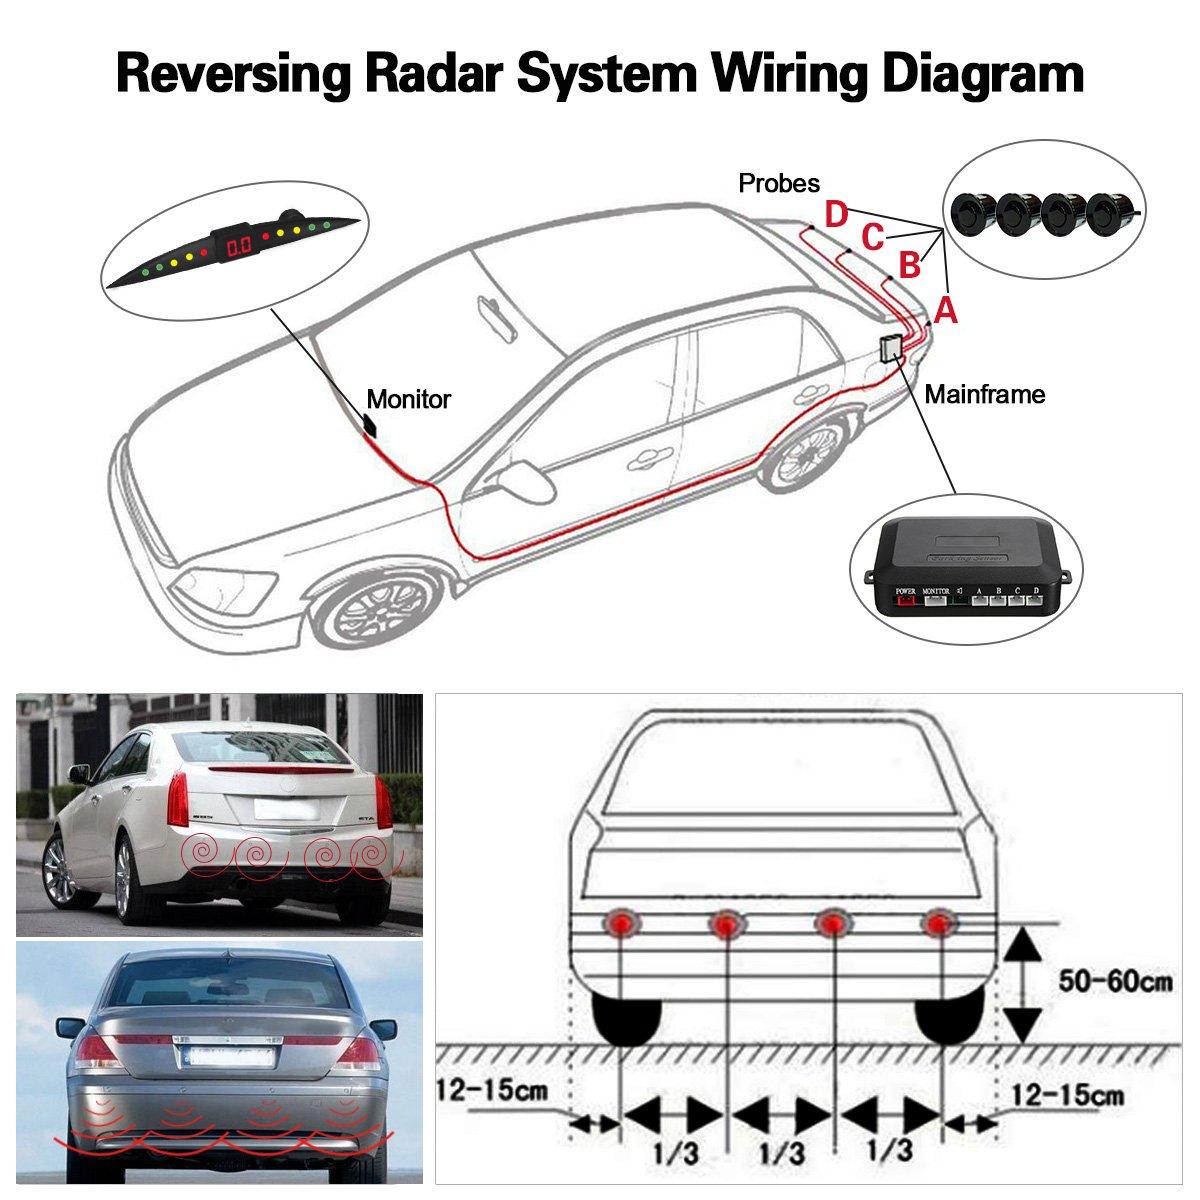 Tvird Car Reverse Backup Radar System 4 Parking Sensors Automotive Lighting Wiring Diagram Safety Sensor Kit With Led Display Reversing Universal Auto